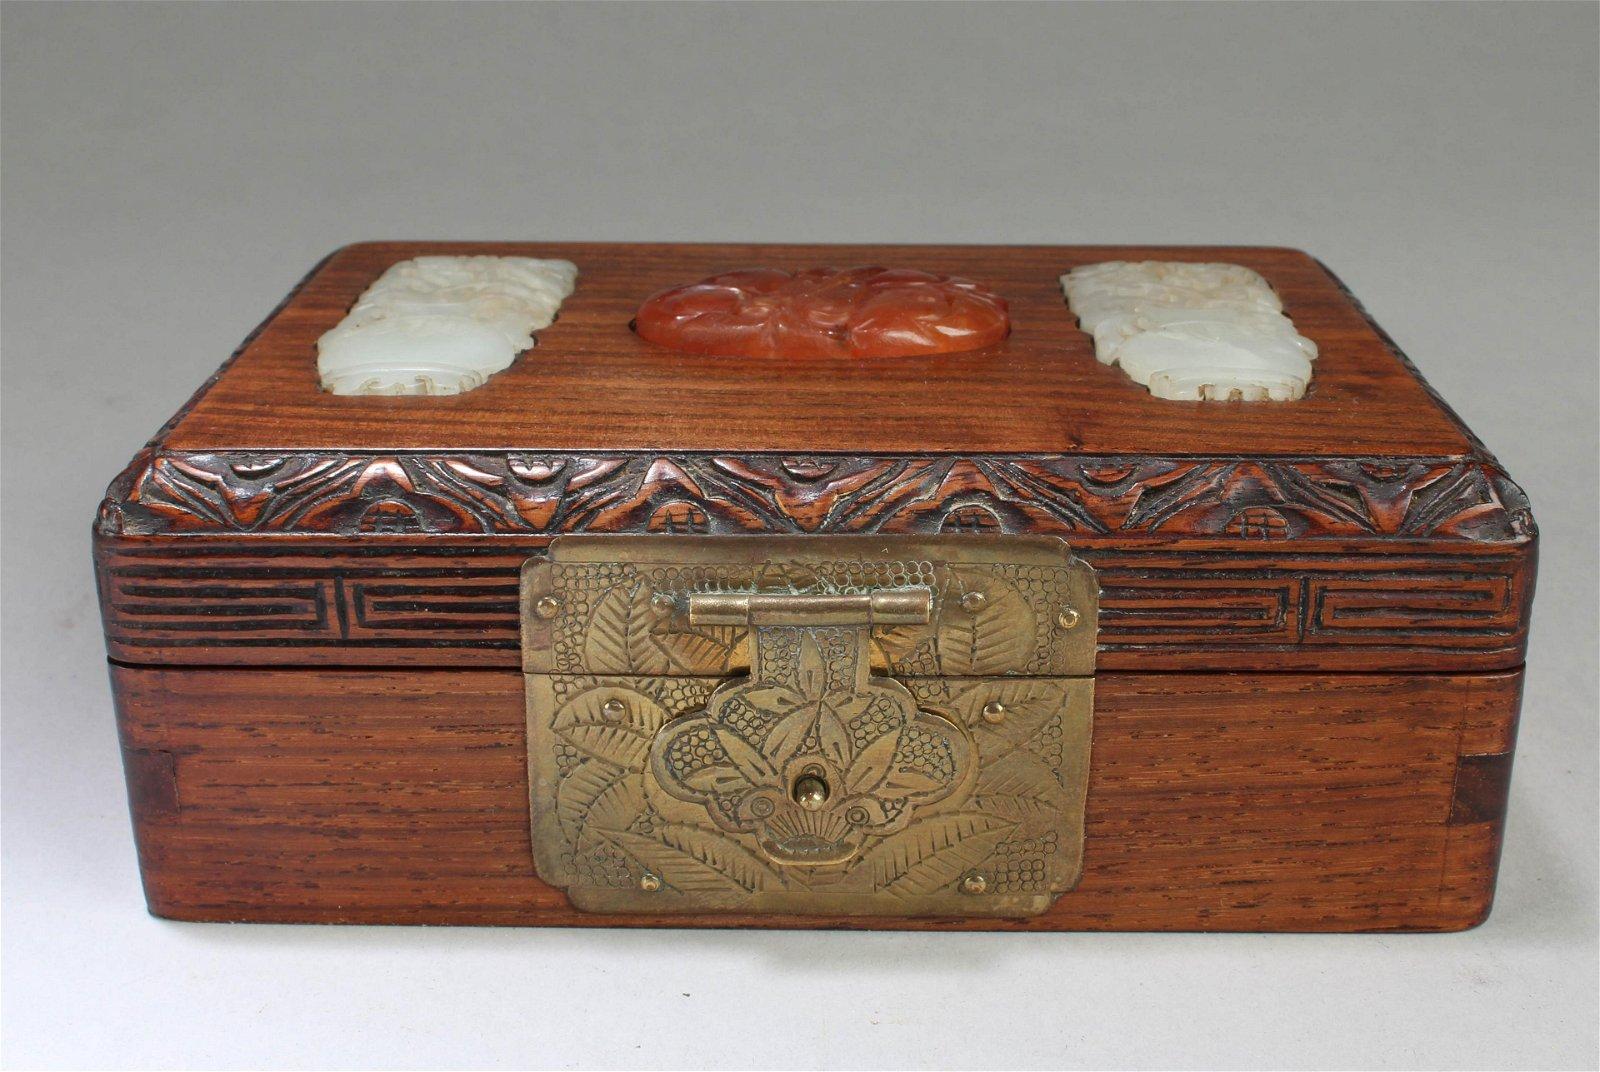 A Hardwood Box with Jade Inlay